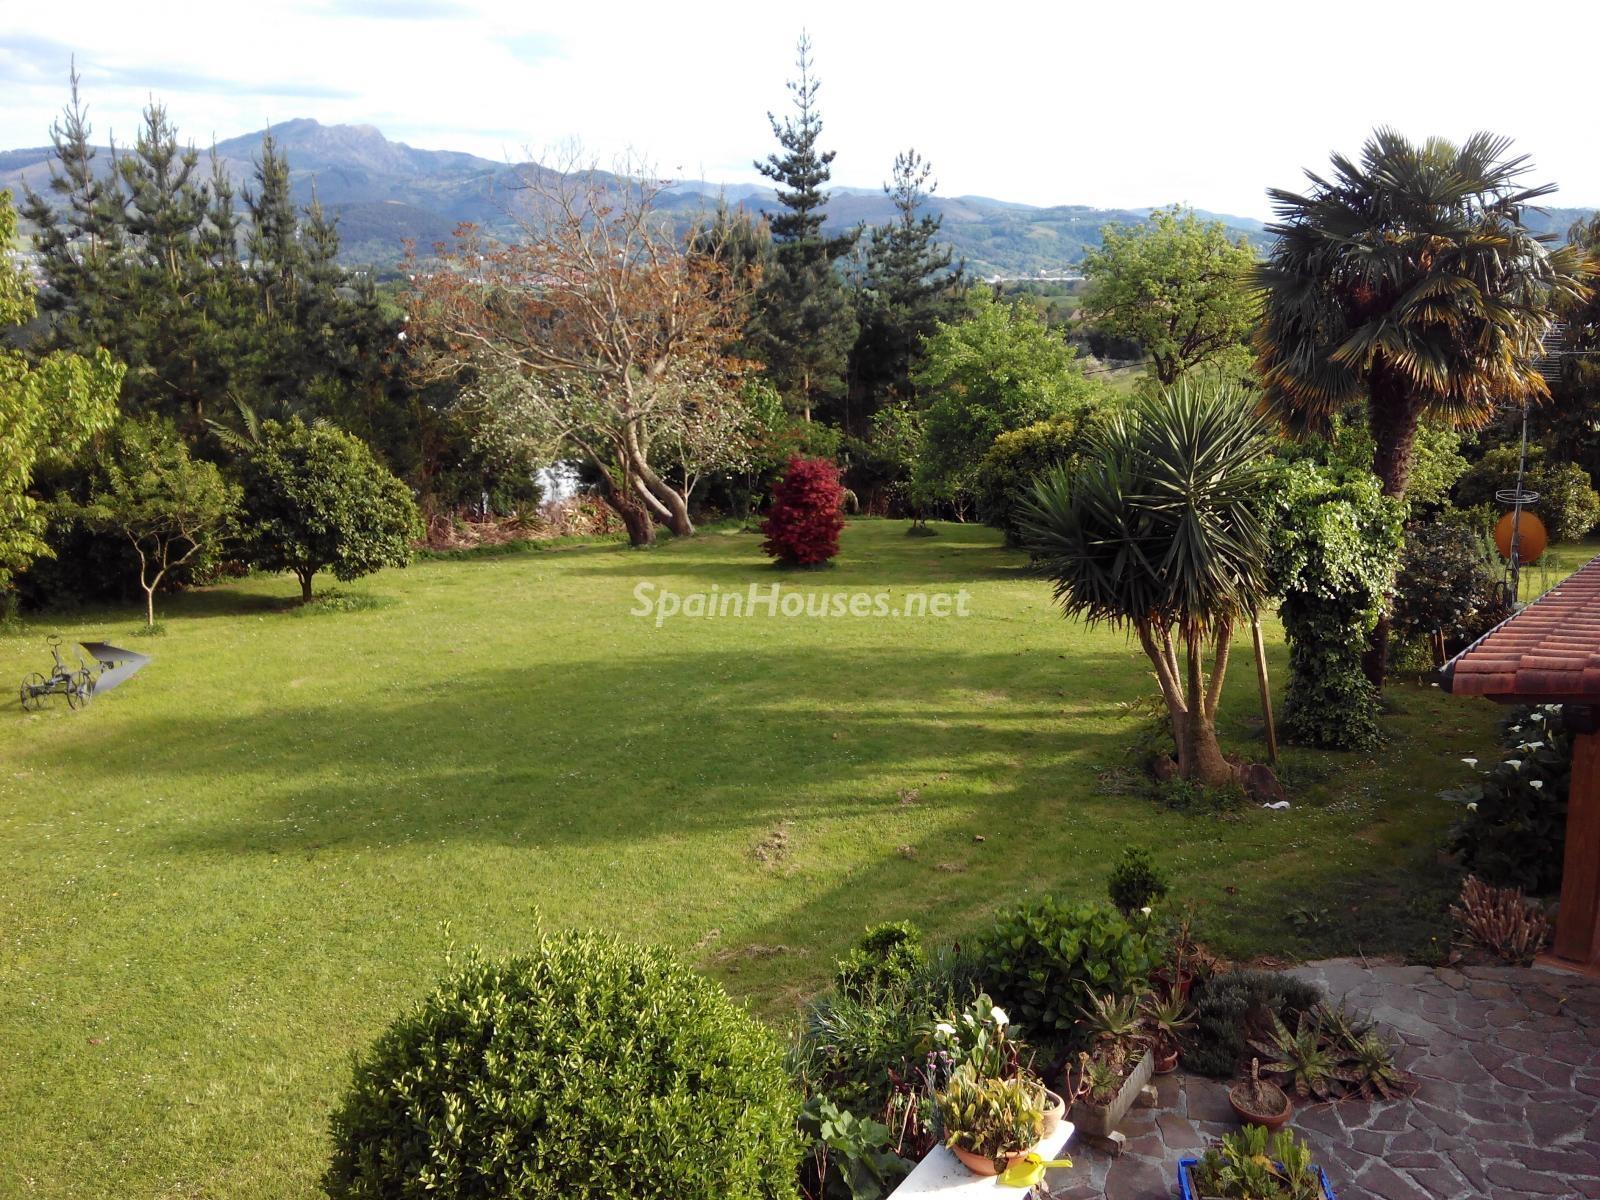 7. House for sale in Hondarribia Guipúzcoa - Charming Country House in Hondarribia, Guipúzcoa